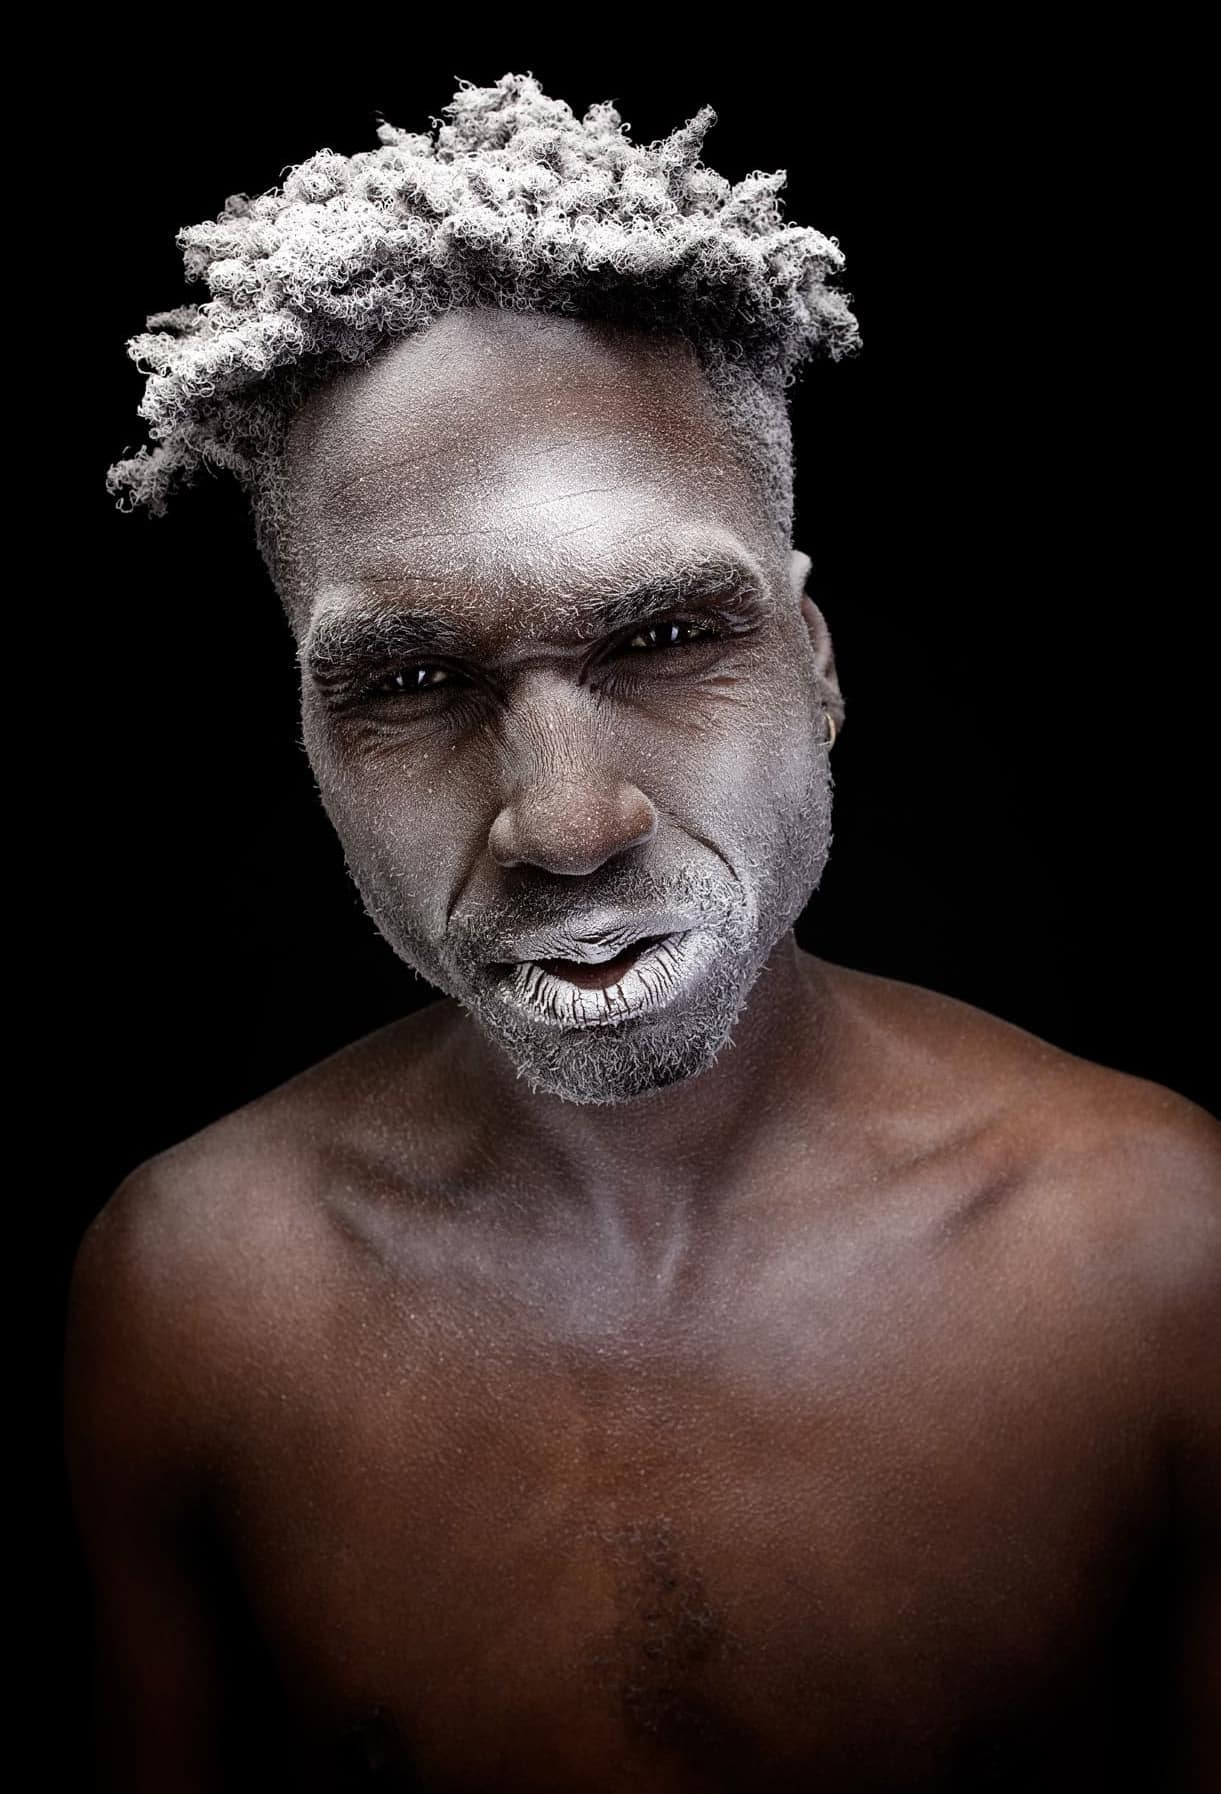 webseite-HolgerAltgeld-Black-and-White-Pascal-Nkongo-Holger-Altgeld-003-1